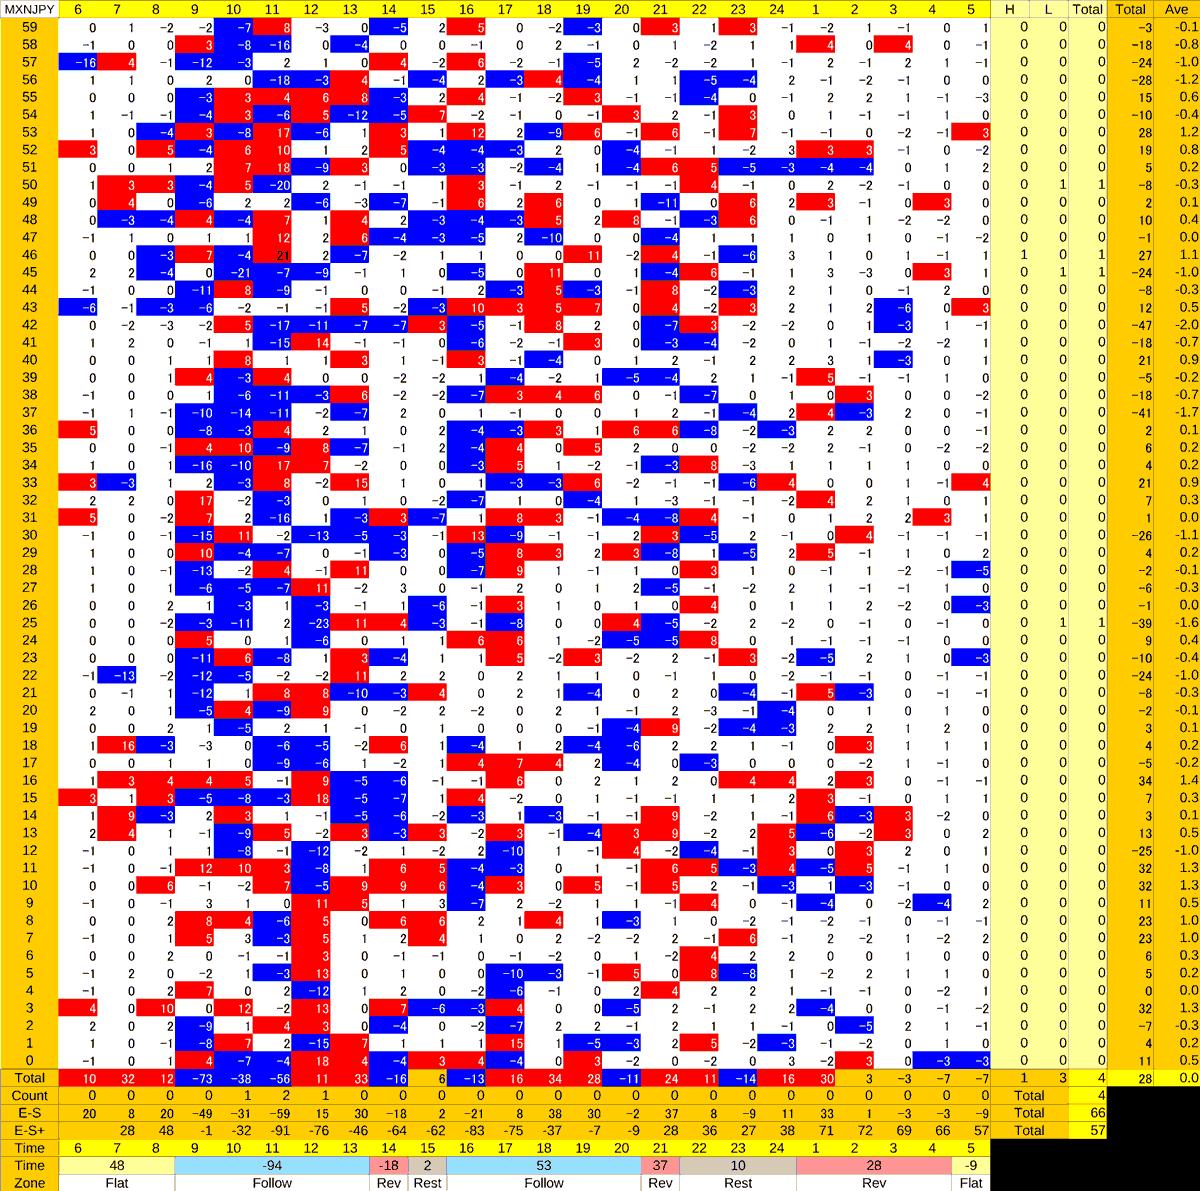 20201104_HS(3)MXNJPY